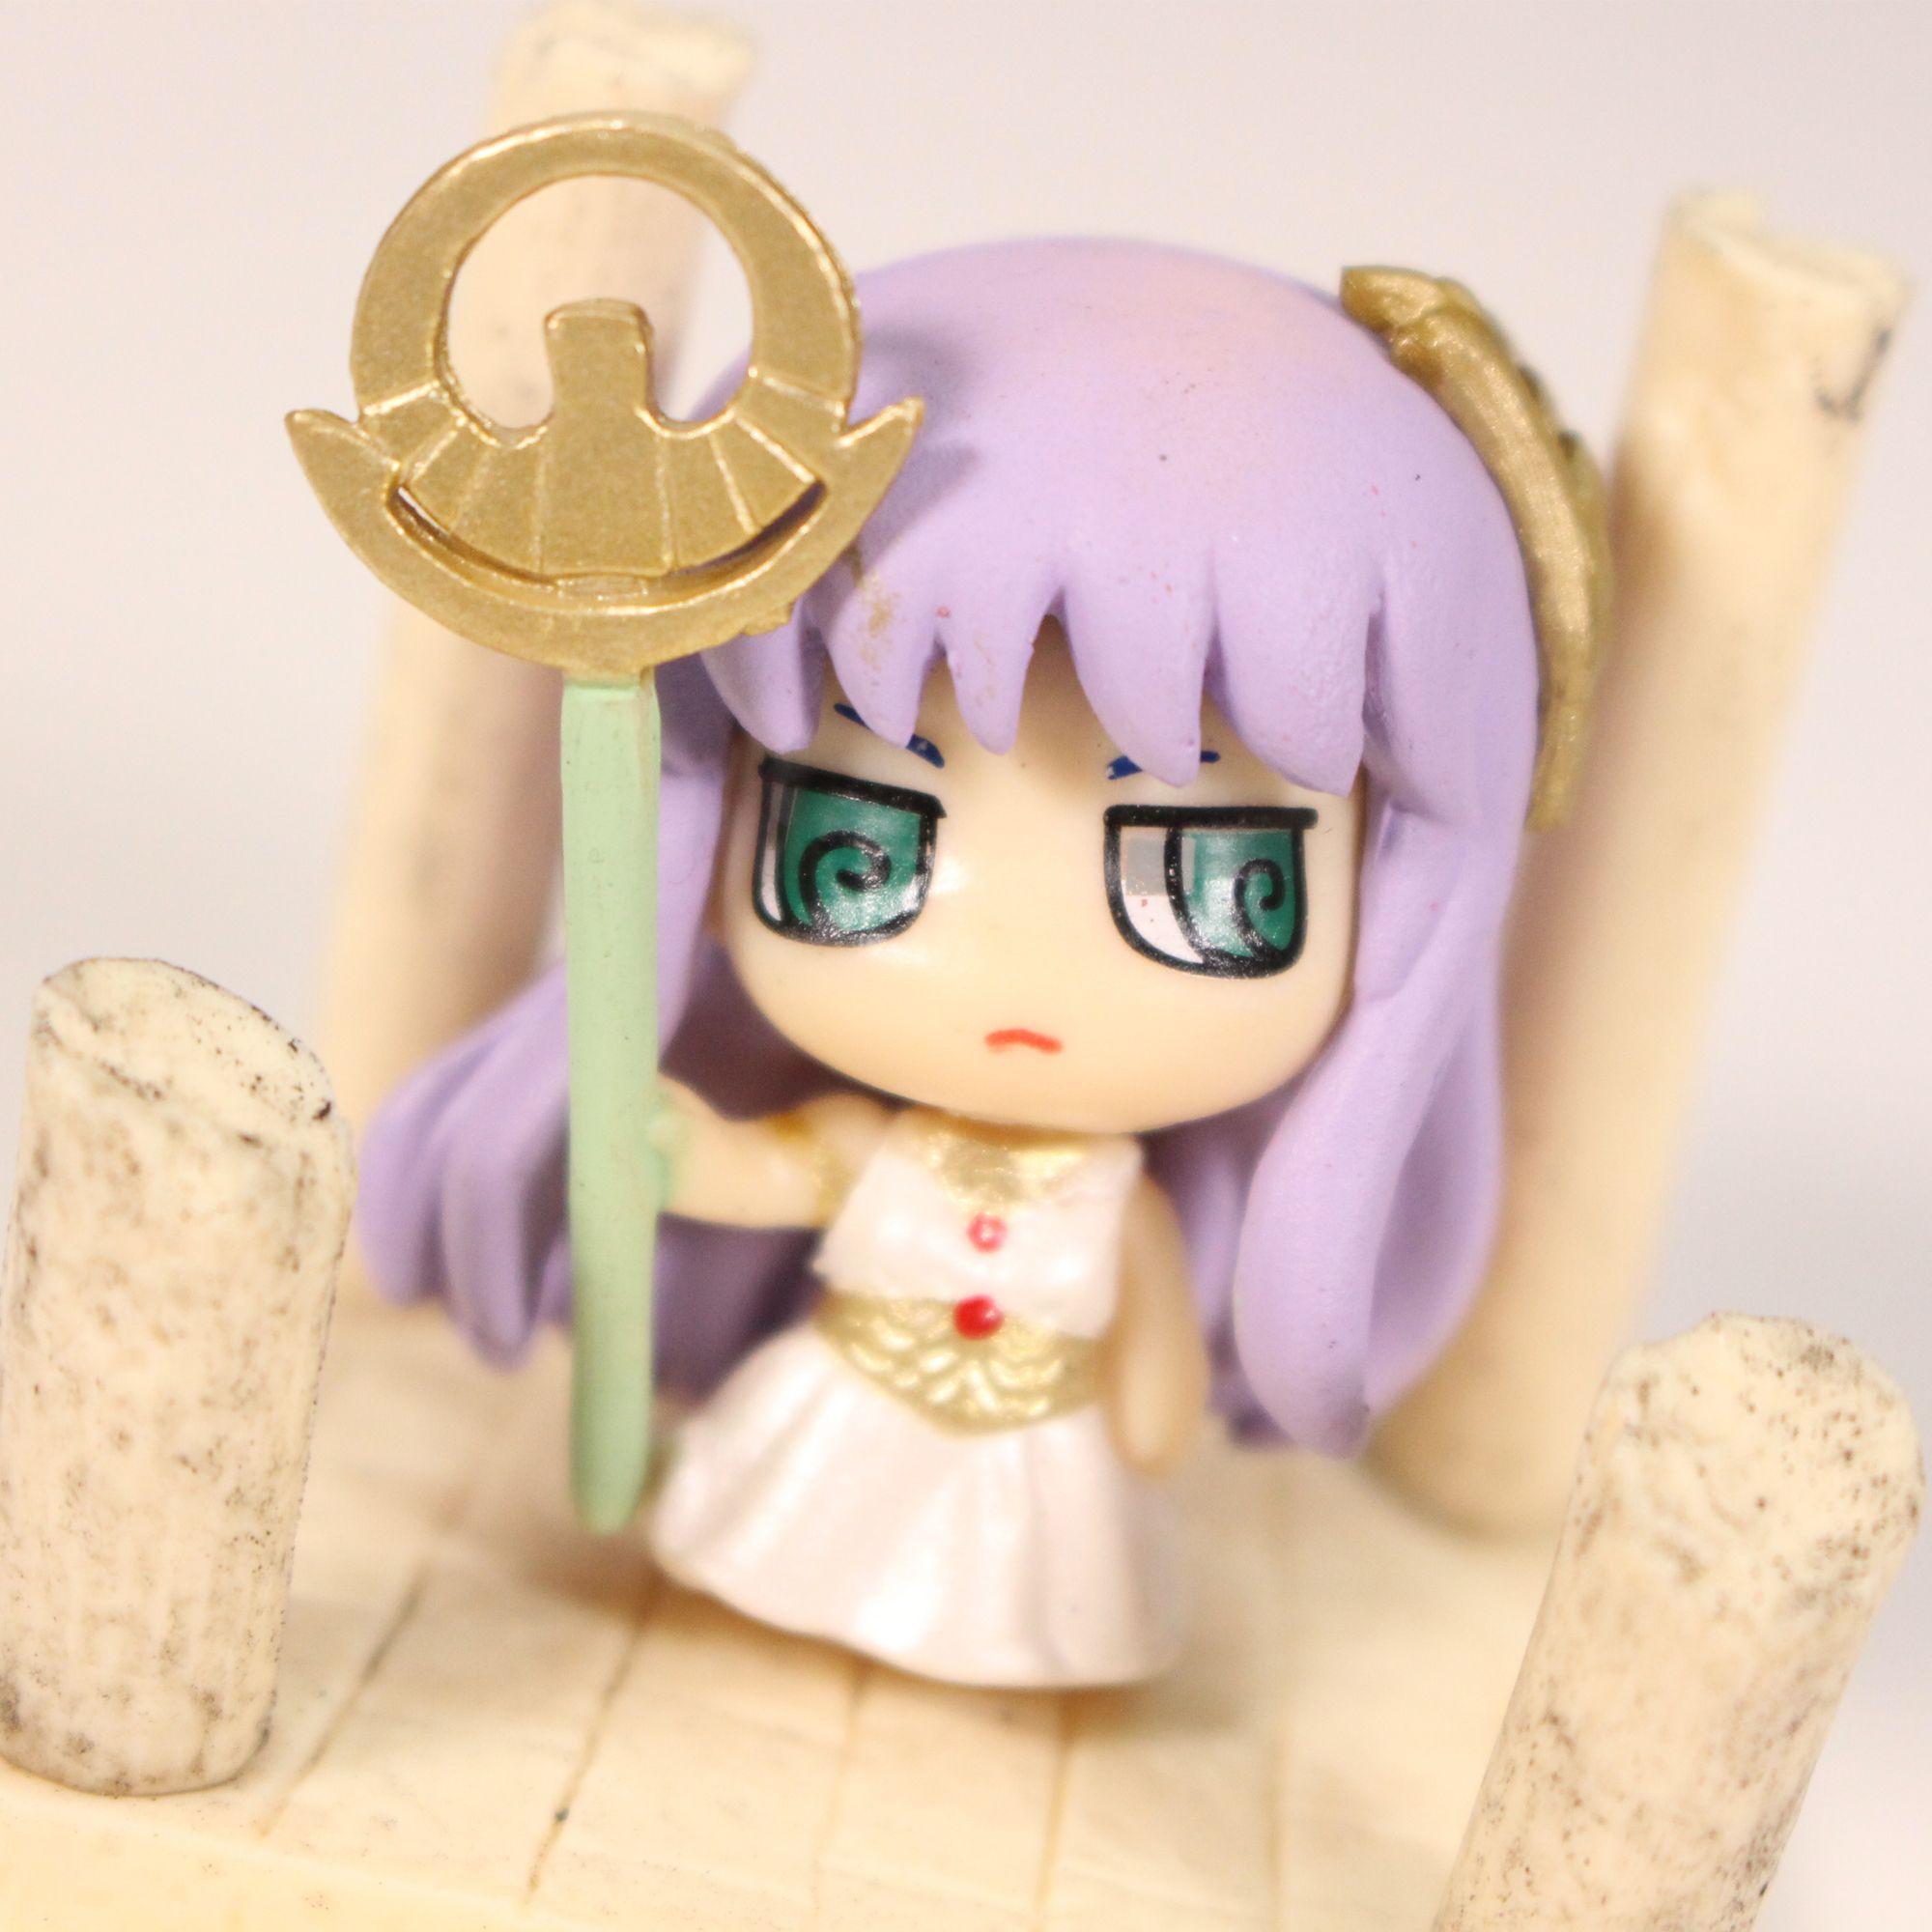 Saori/Athena